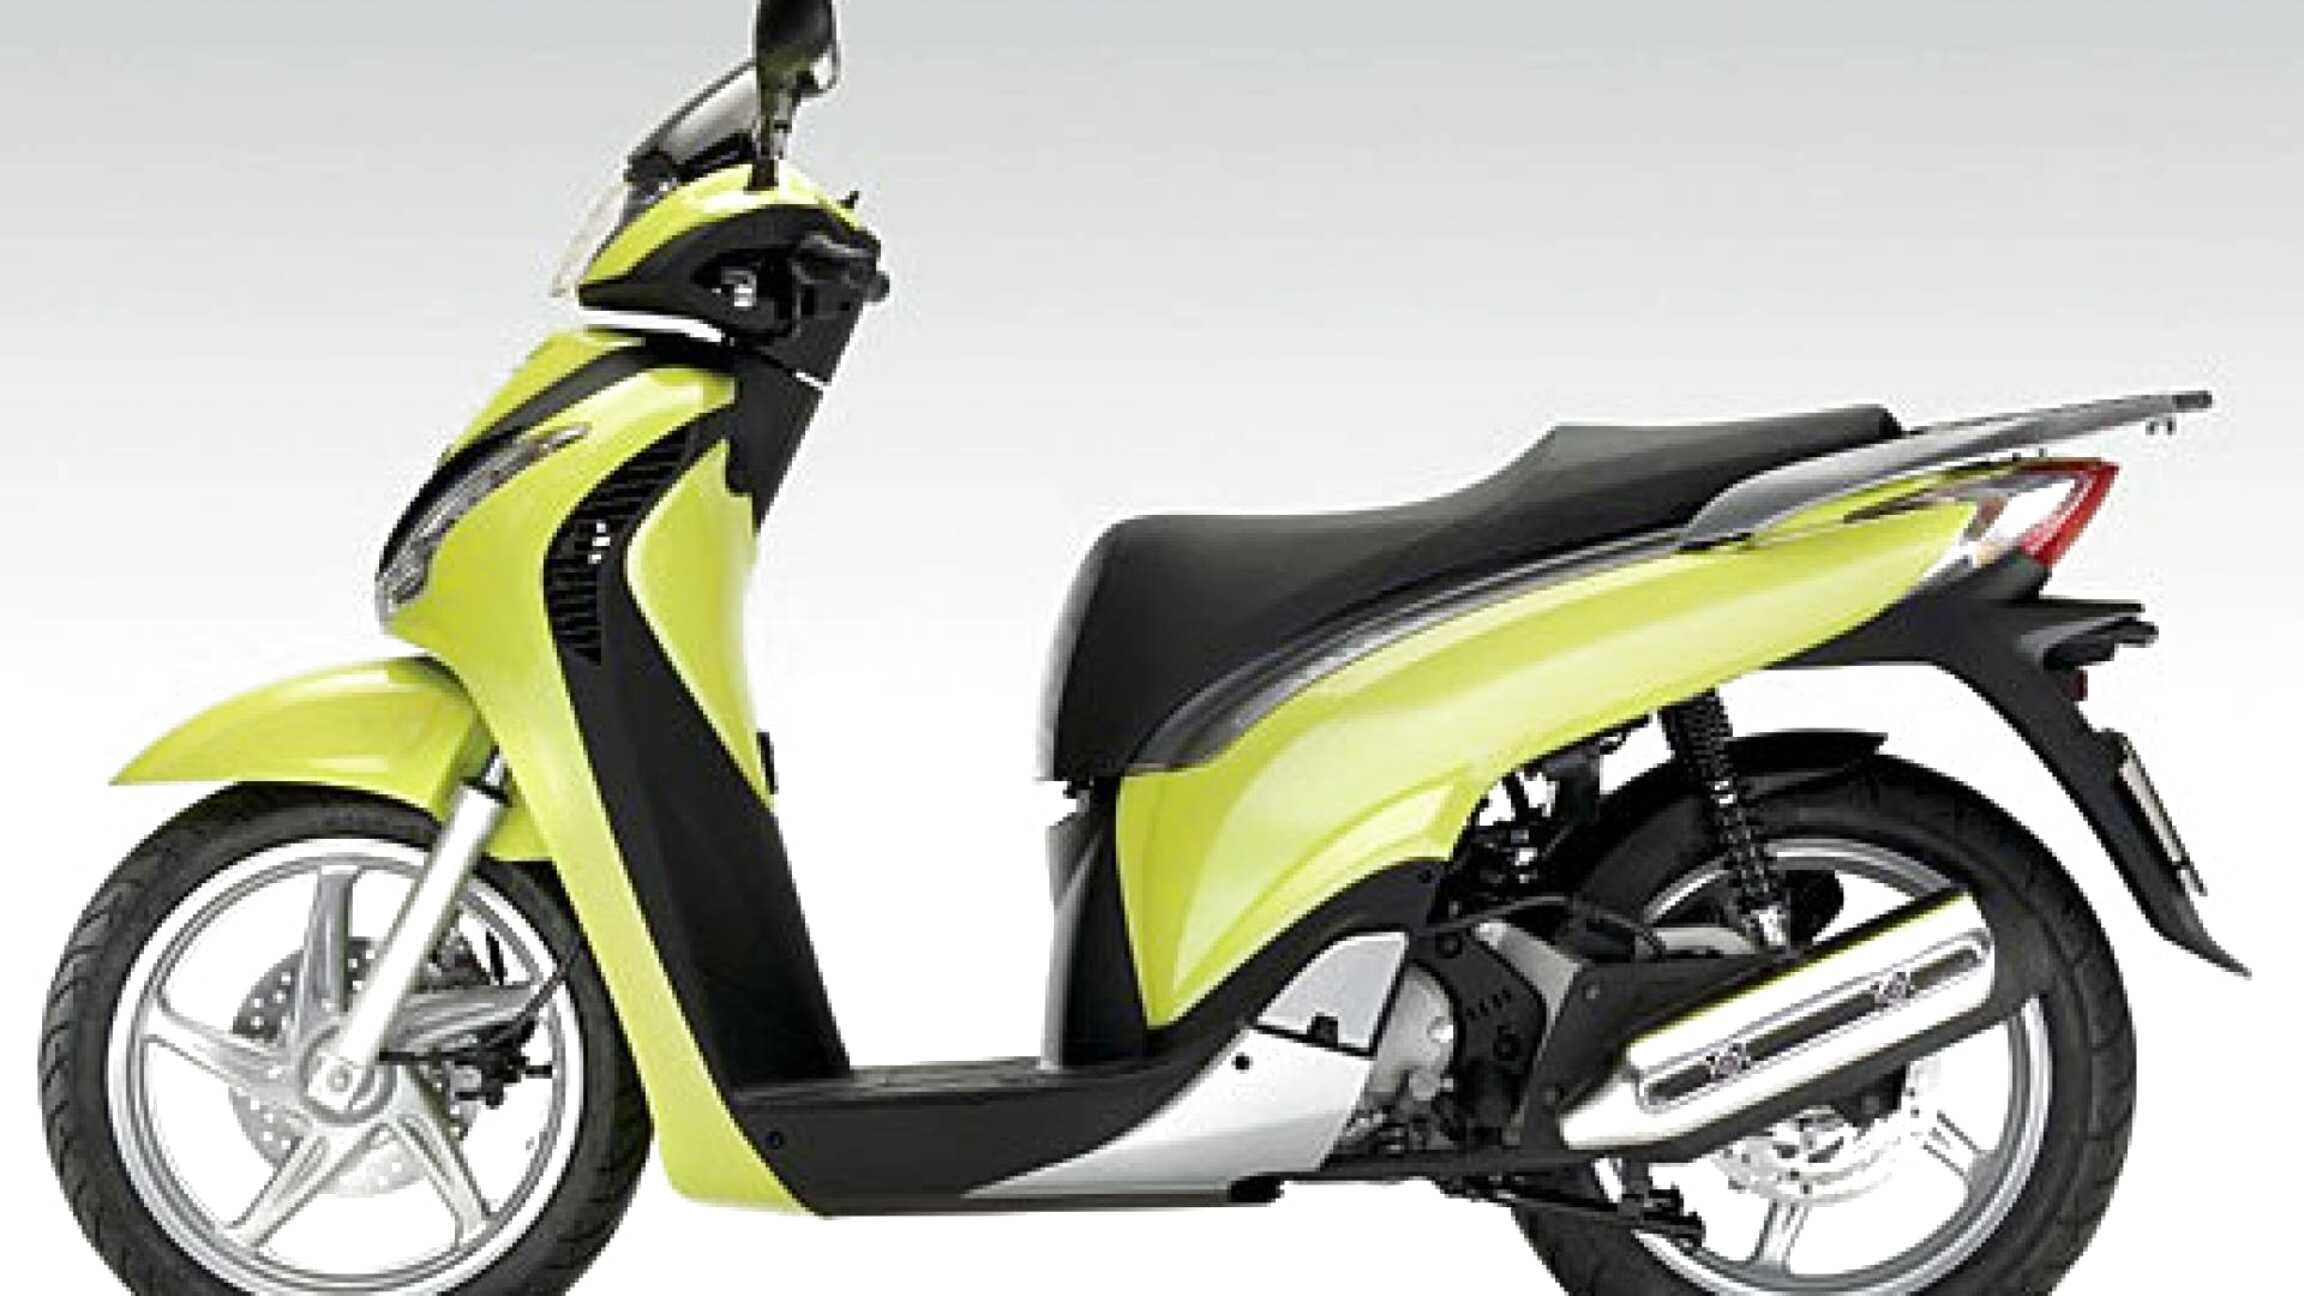 Honda SH150i 2005 de segunda mano por 1.220 € en Barcelona